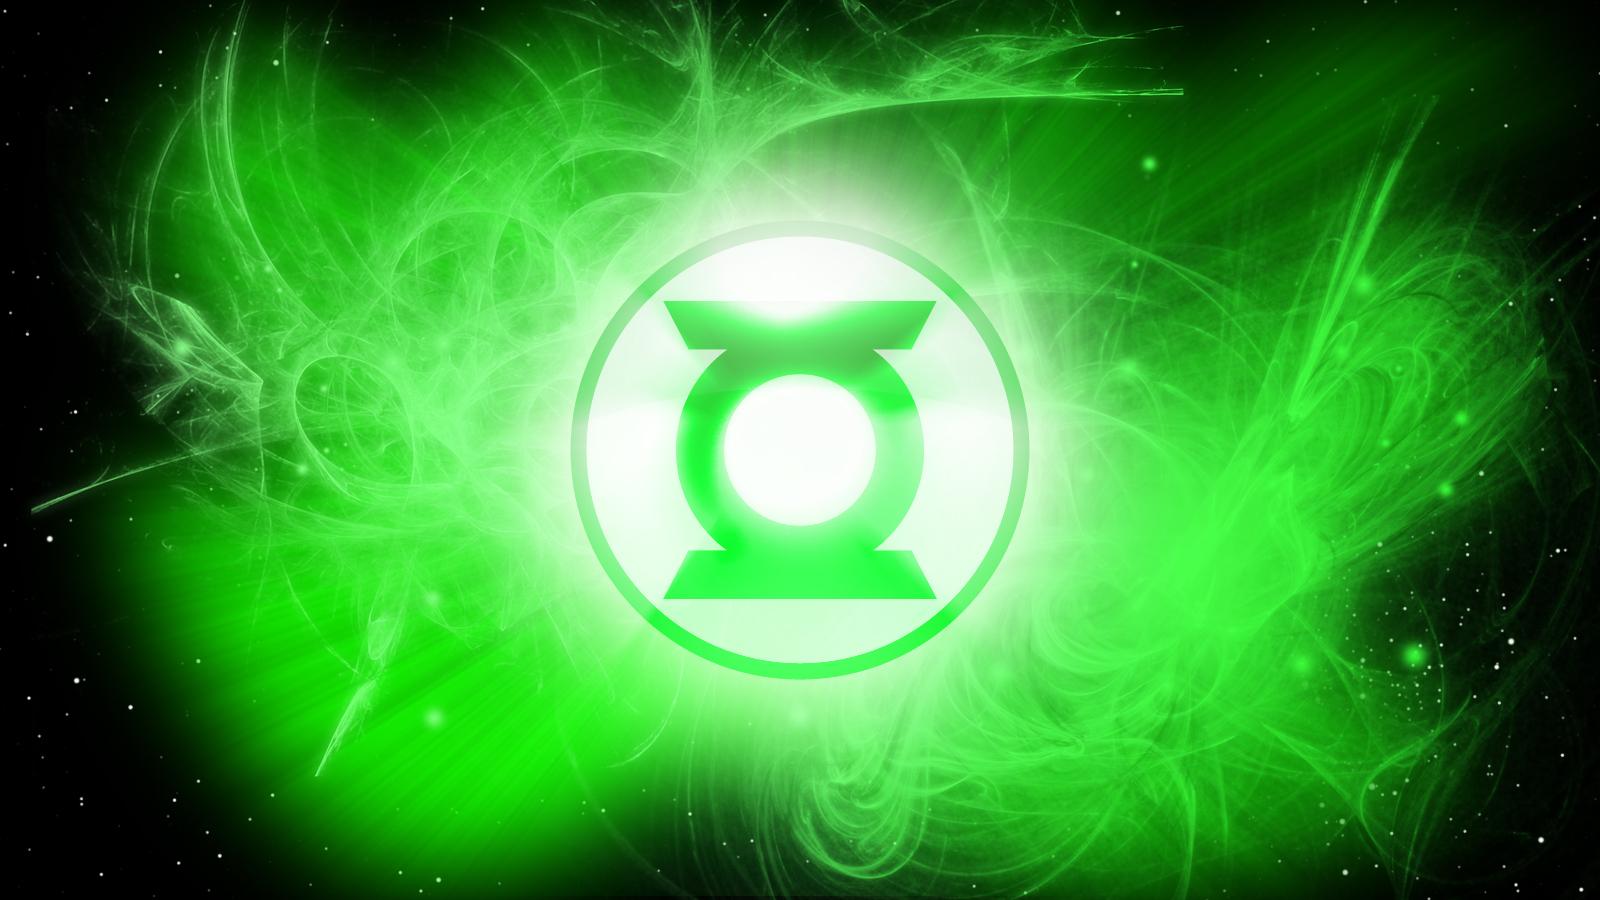 http://3.bp.blogspot.com/-upN-kOVF-Xw/TscT4Z9MtJI/AAAAAAAAAdI/VWSnCVcbePQ/s1600/green-lantern-wallpaper-1-700954.jpg